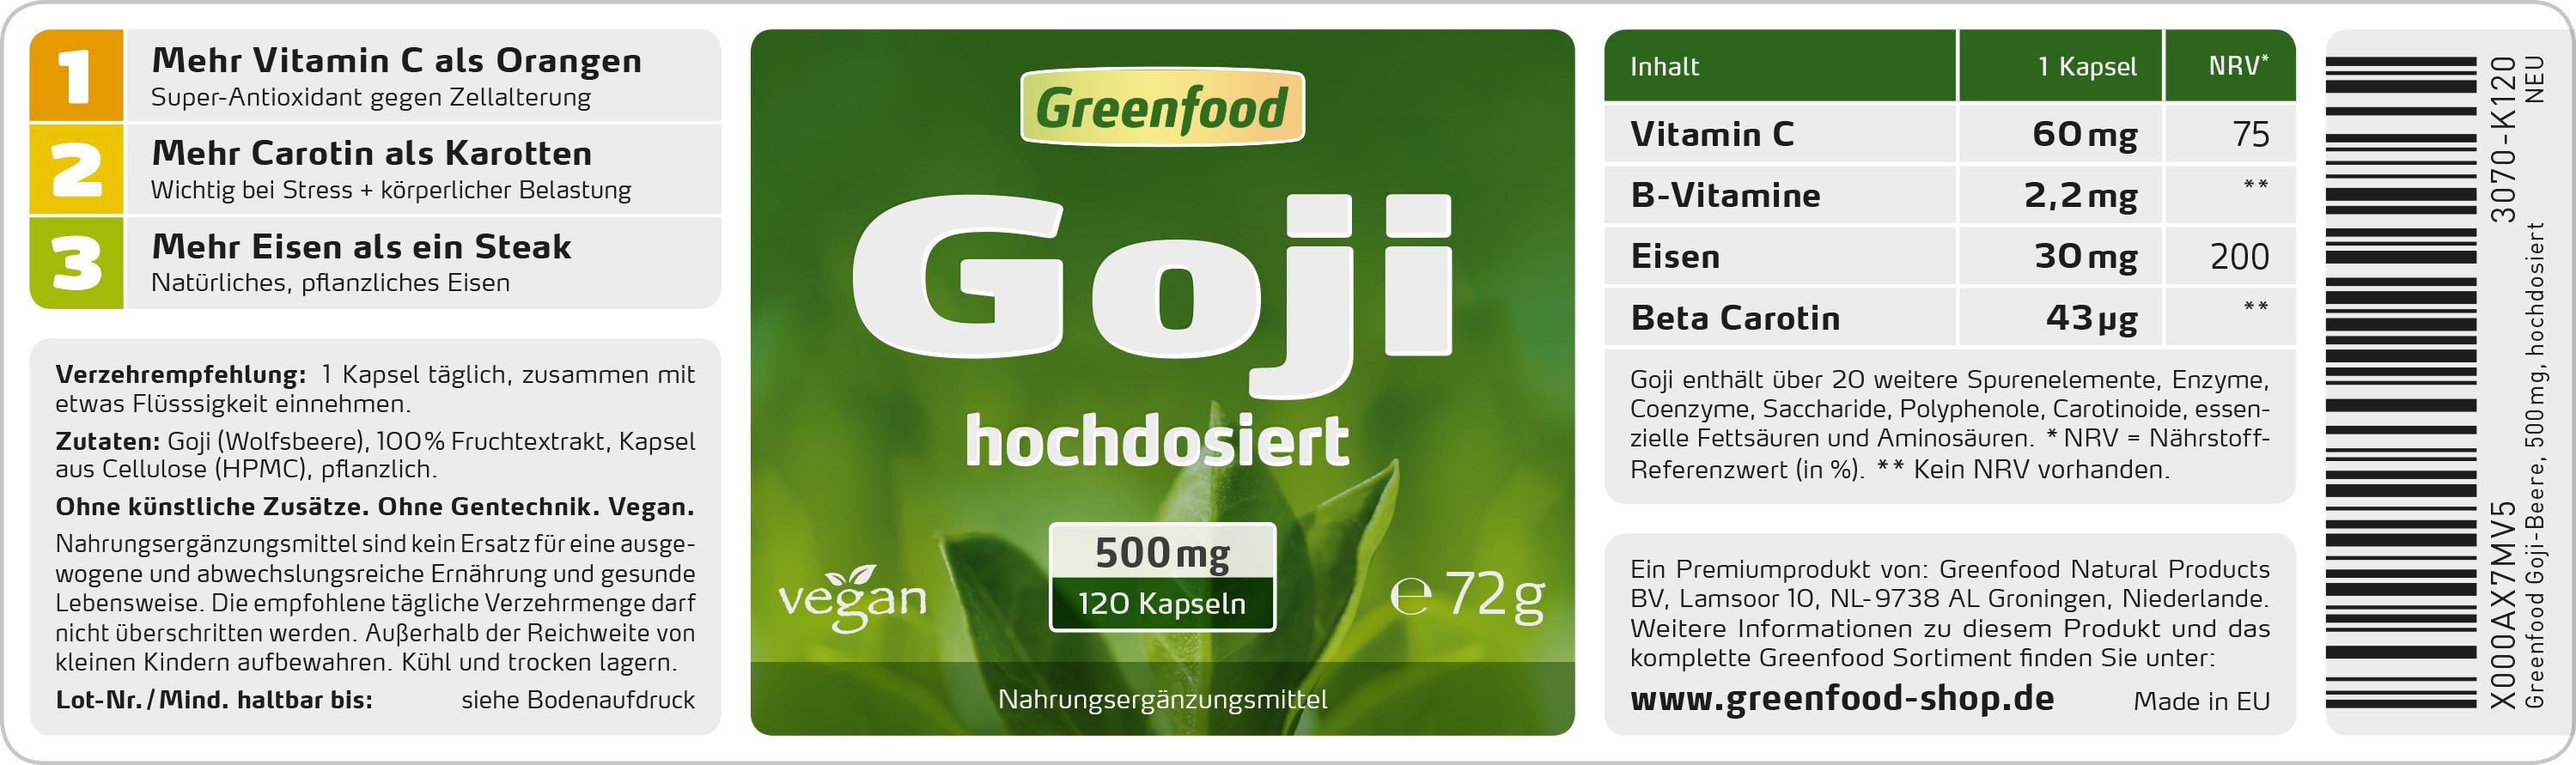 greenfood goji beere 500mg hochdosiert 120 kapseln. Black Bedroom Furniture Sets. Home Design Ideas